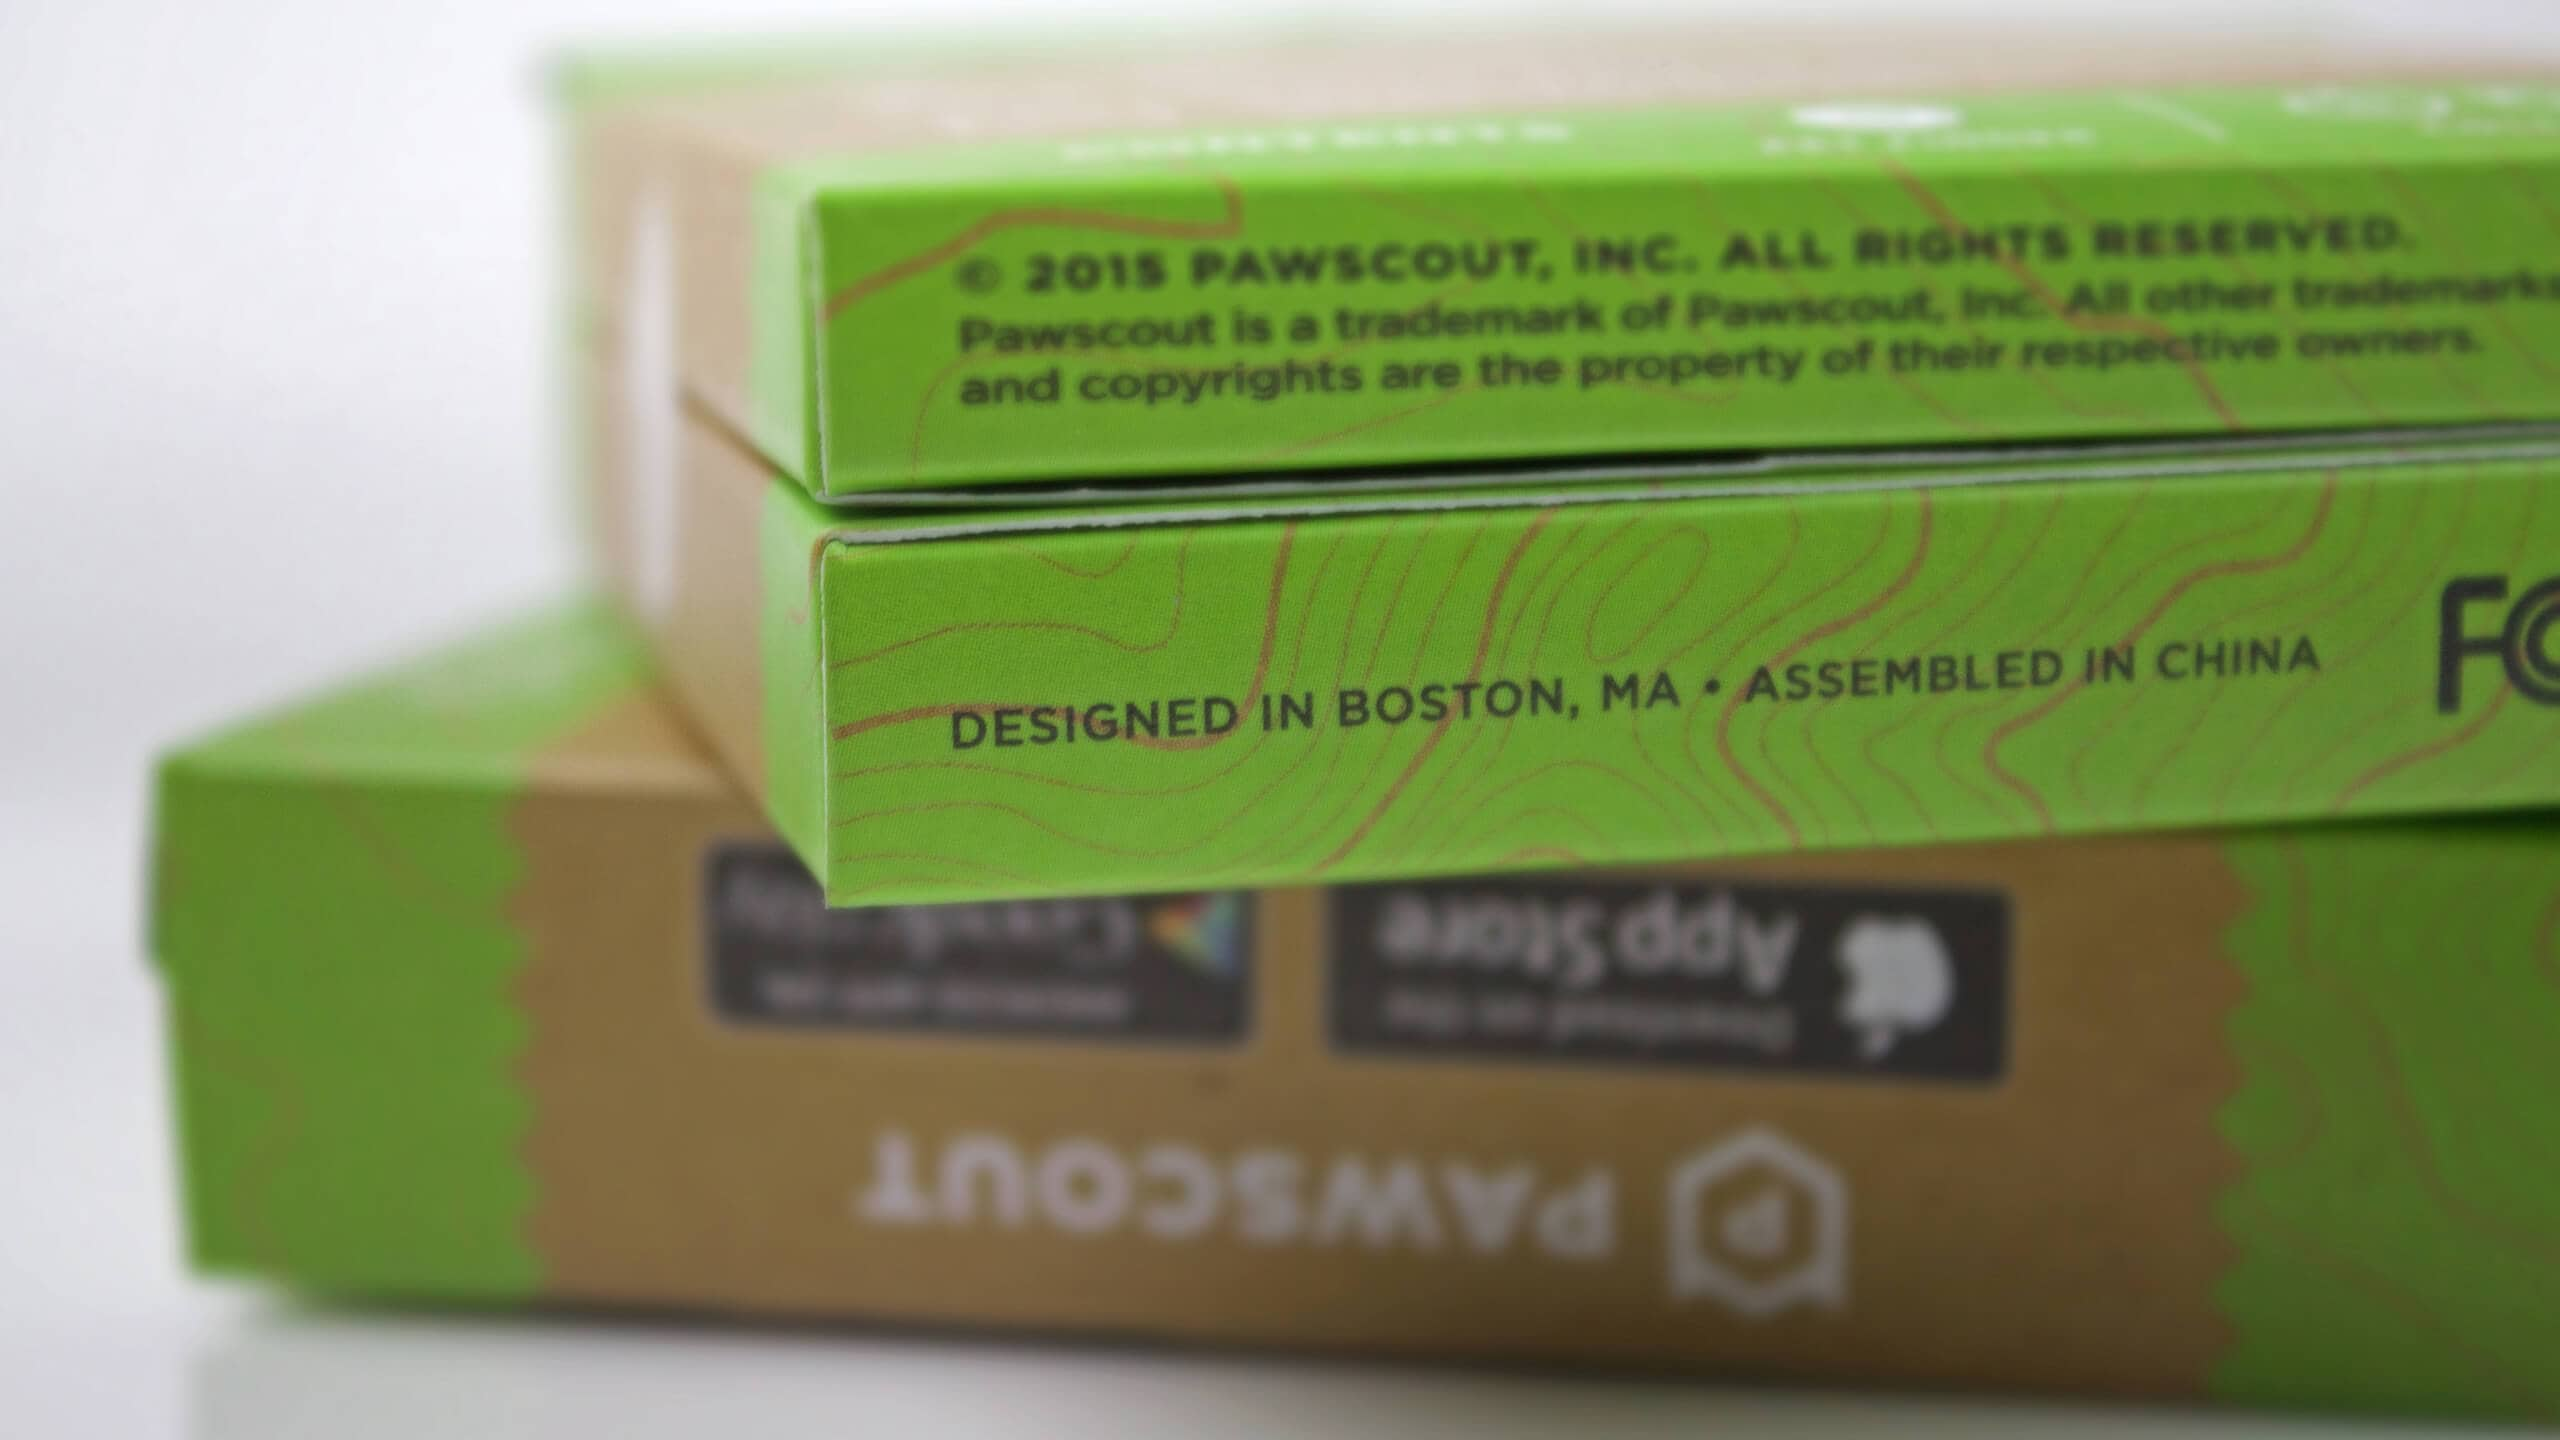 Sprout studios, Boston, industrial design, product design, start up, Pawscout, digital pet tag, pet tracker, branding, logo design, packaging design, app design, Ux/ui design, website design, 3D printing